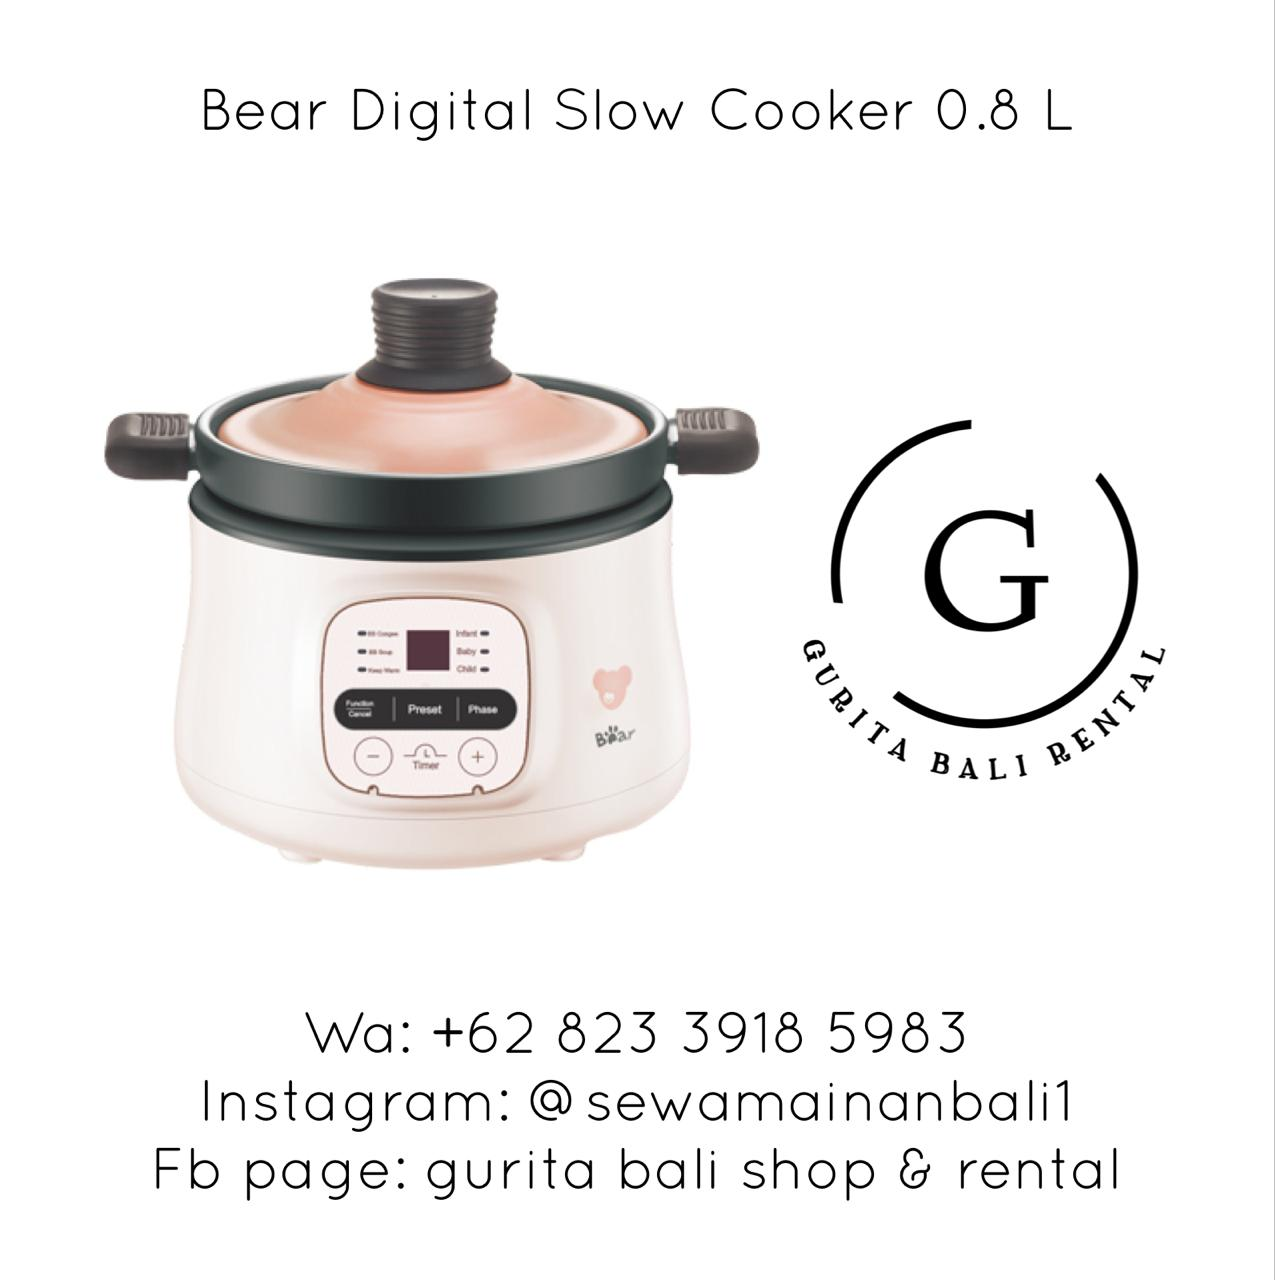 BEAR DIGITAL SLOW COOKER 0.8 L (2)